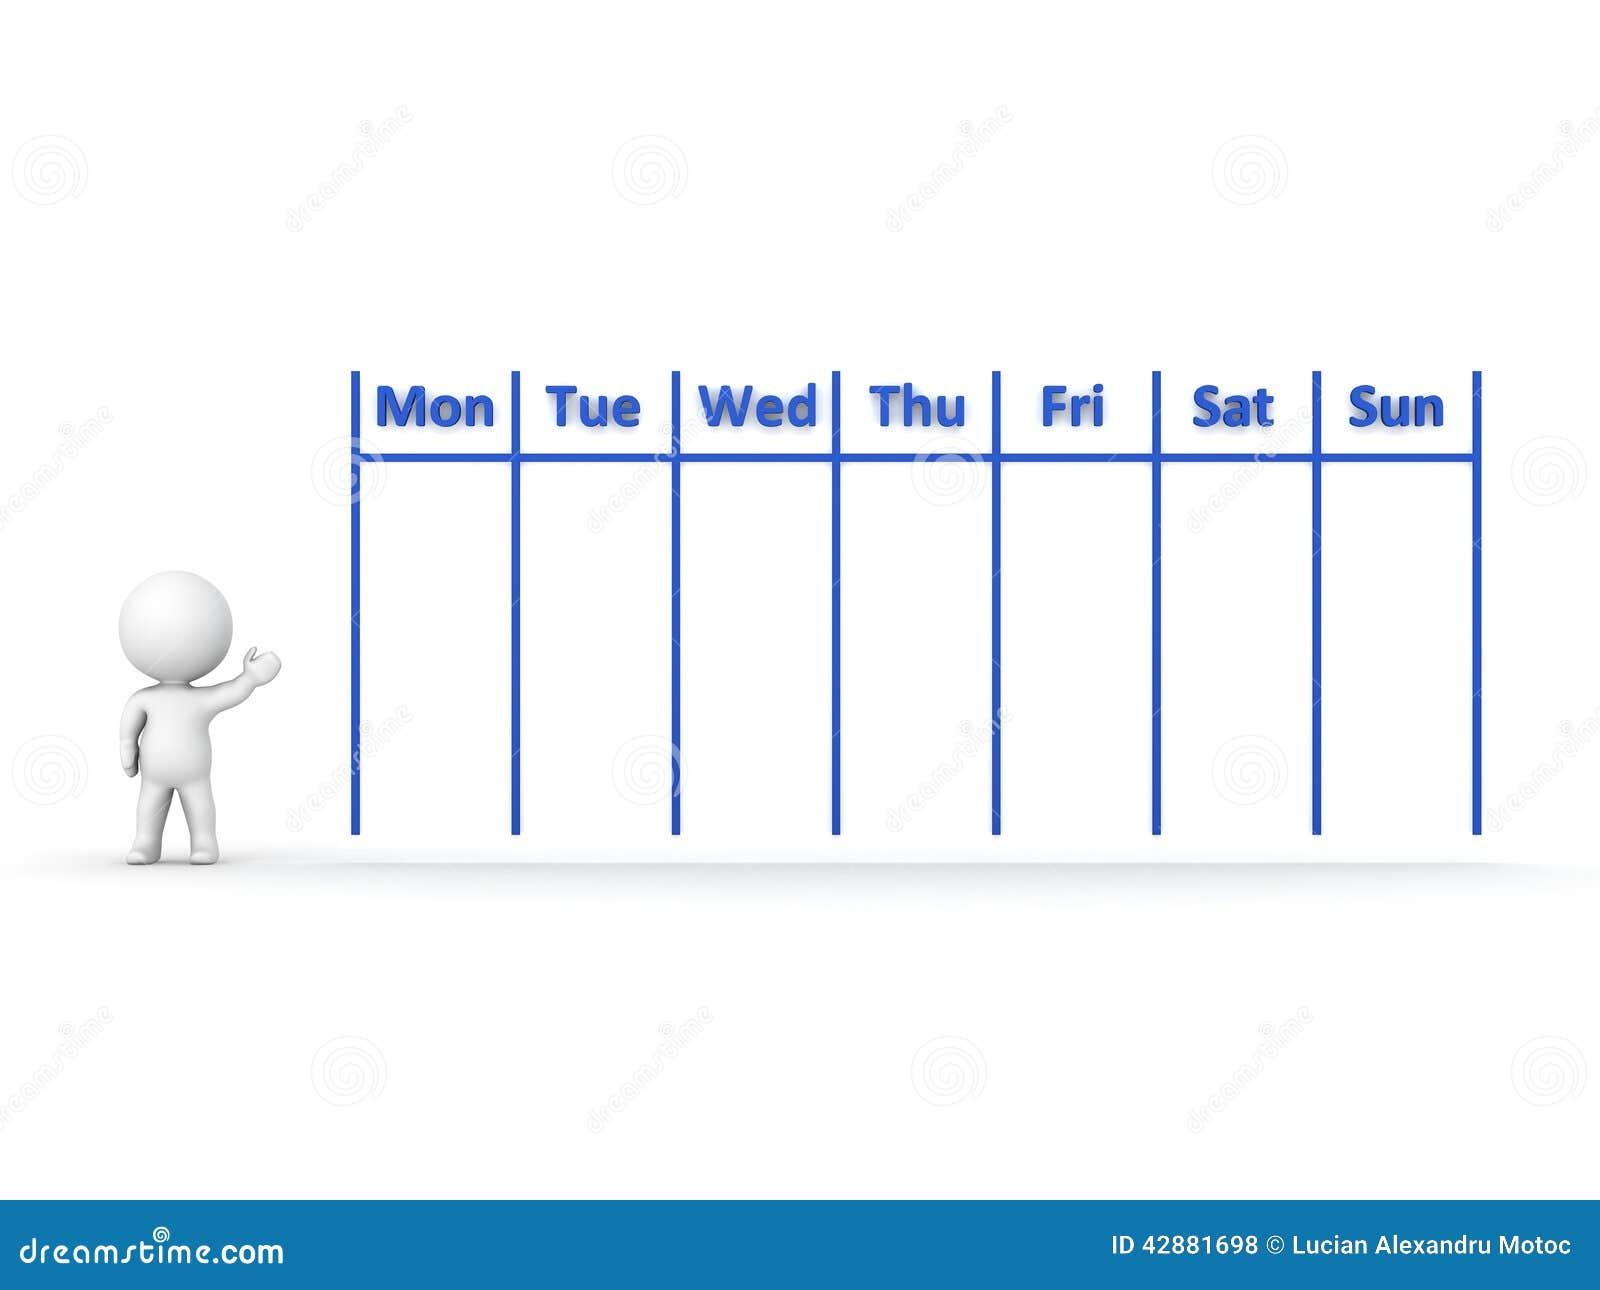 Weekly Calendar Cartoon : D character showing calendar for week stock illustration